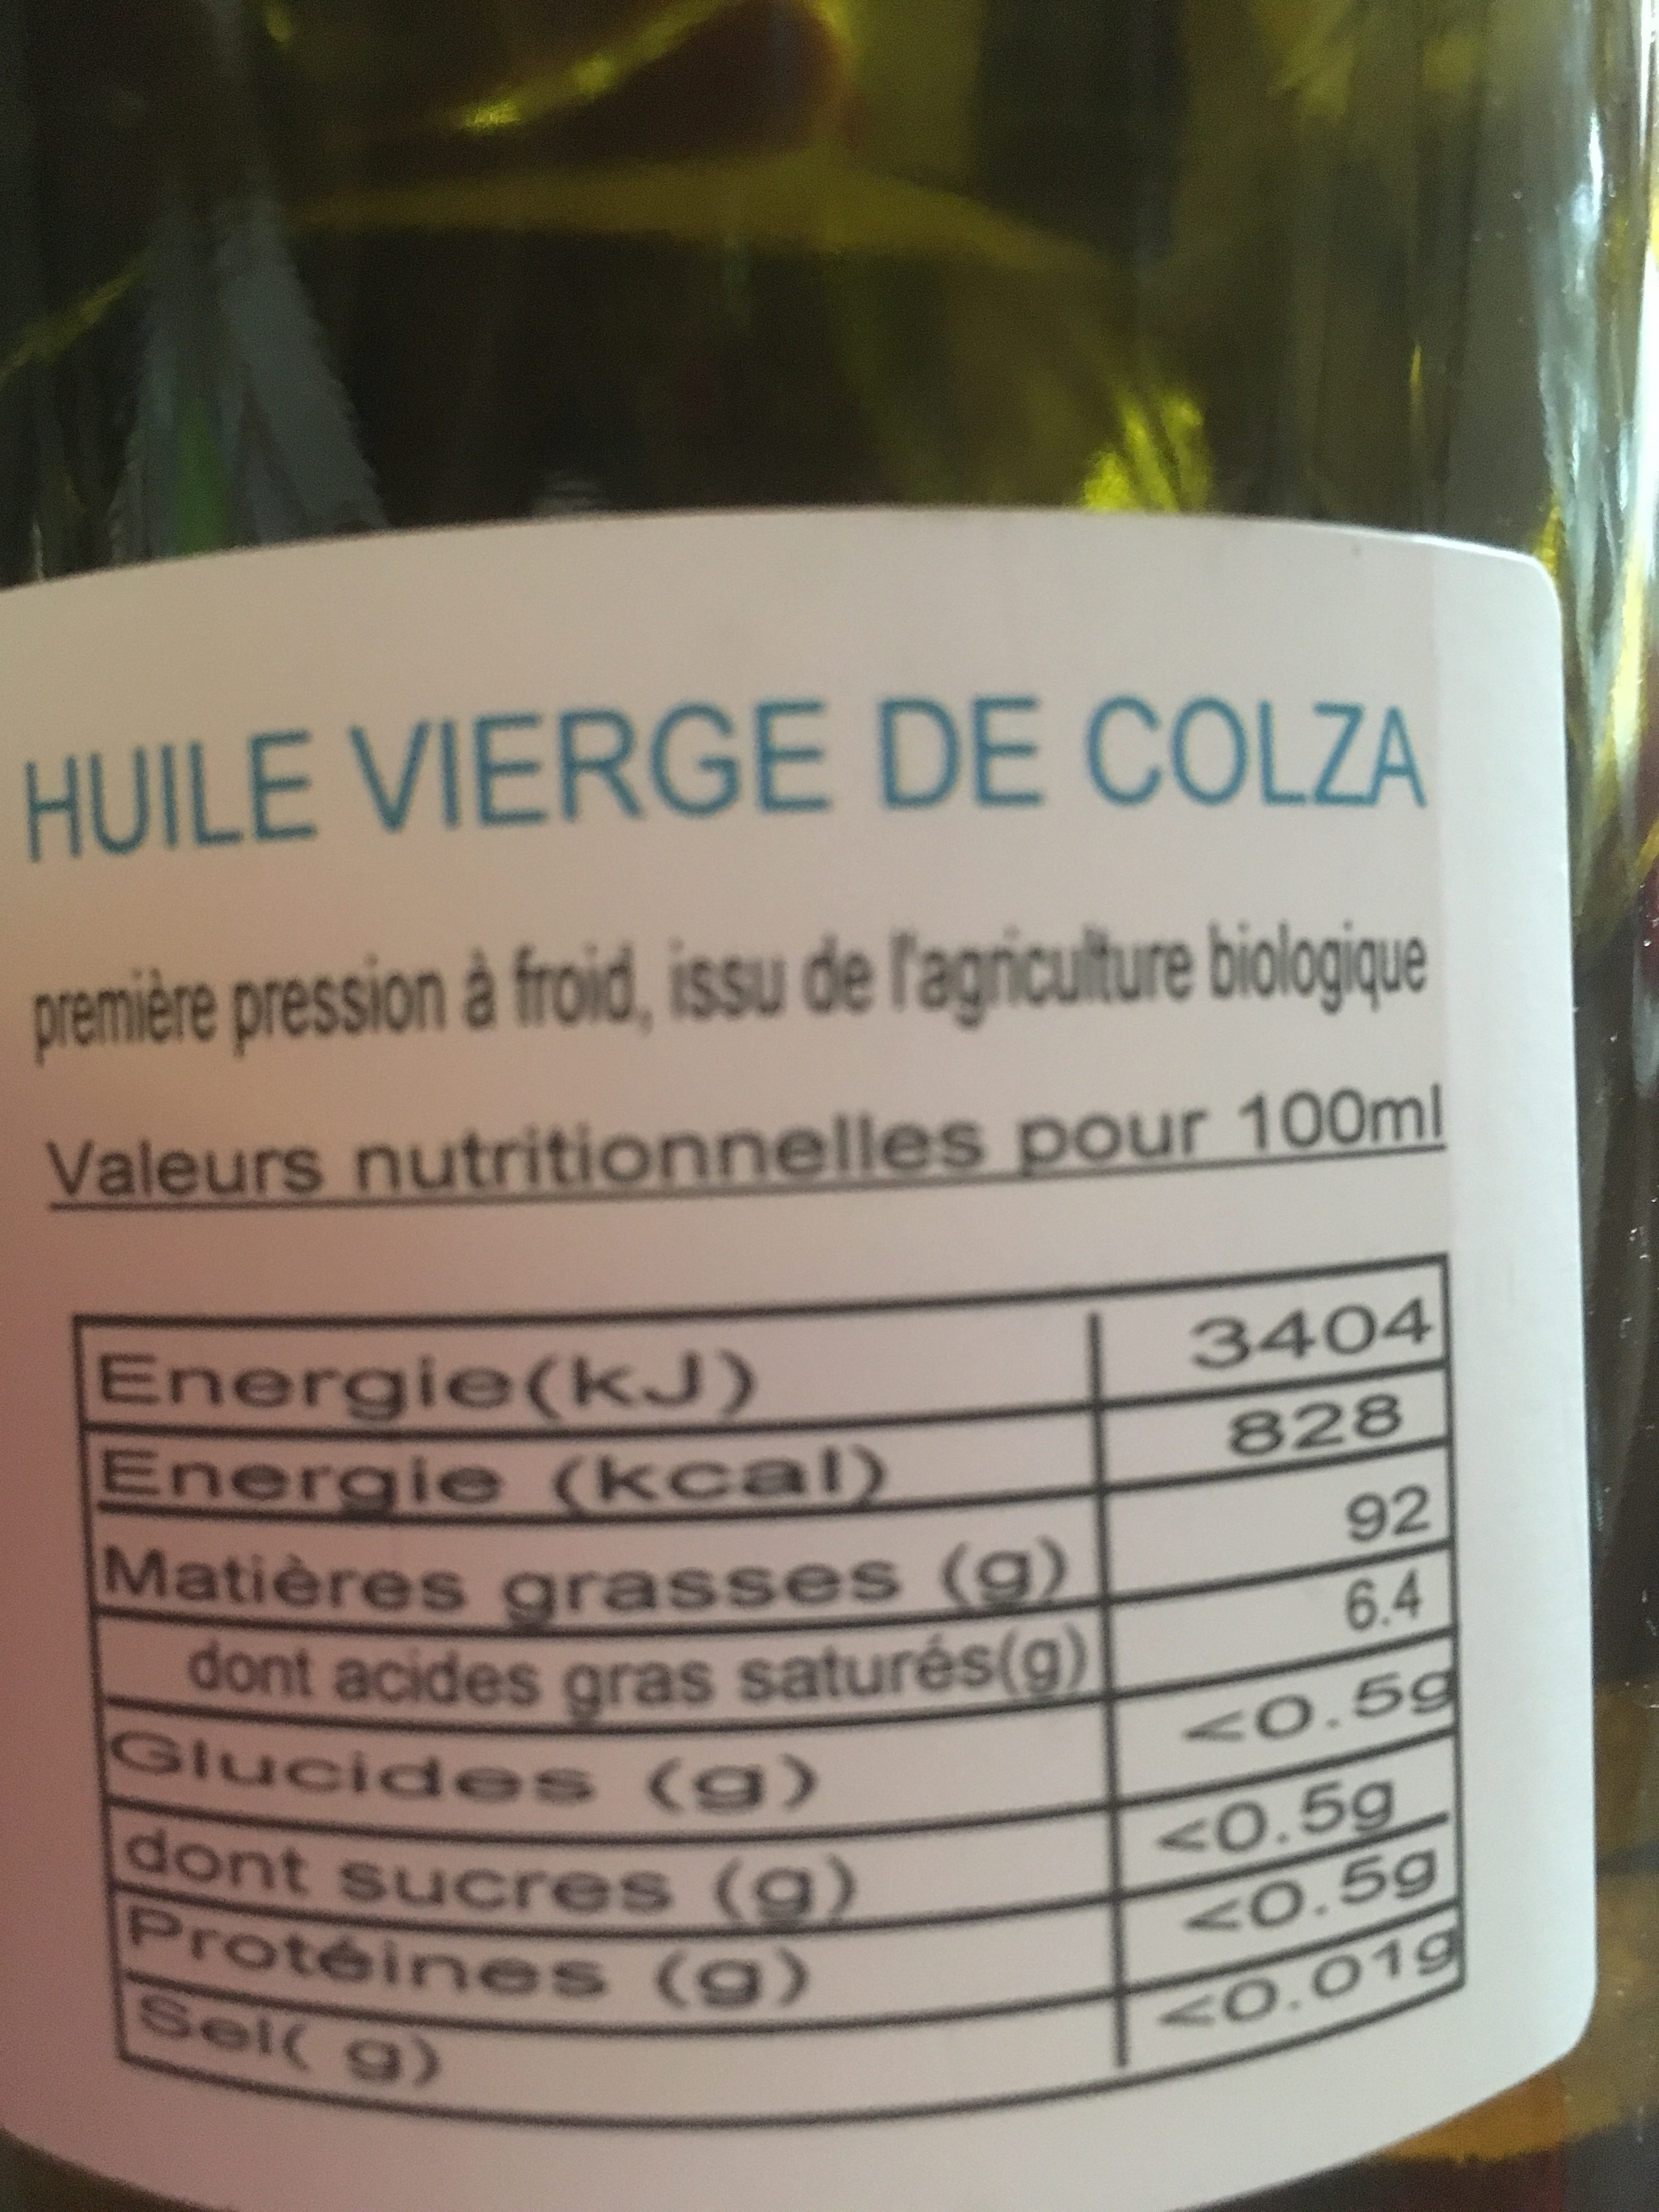 Huile vierge de colza - Ingredienti - fr